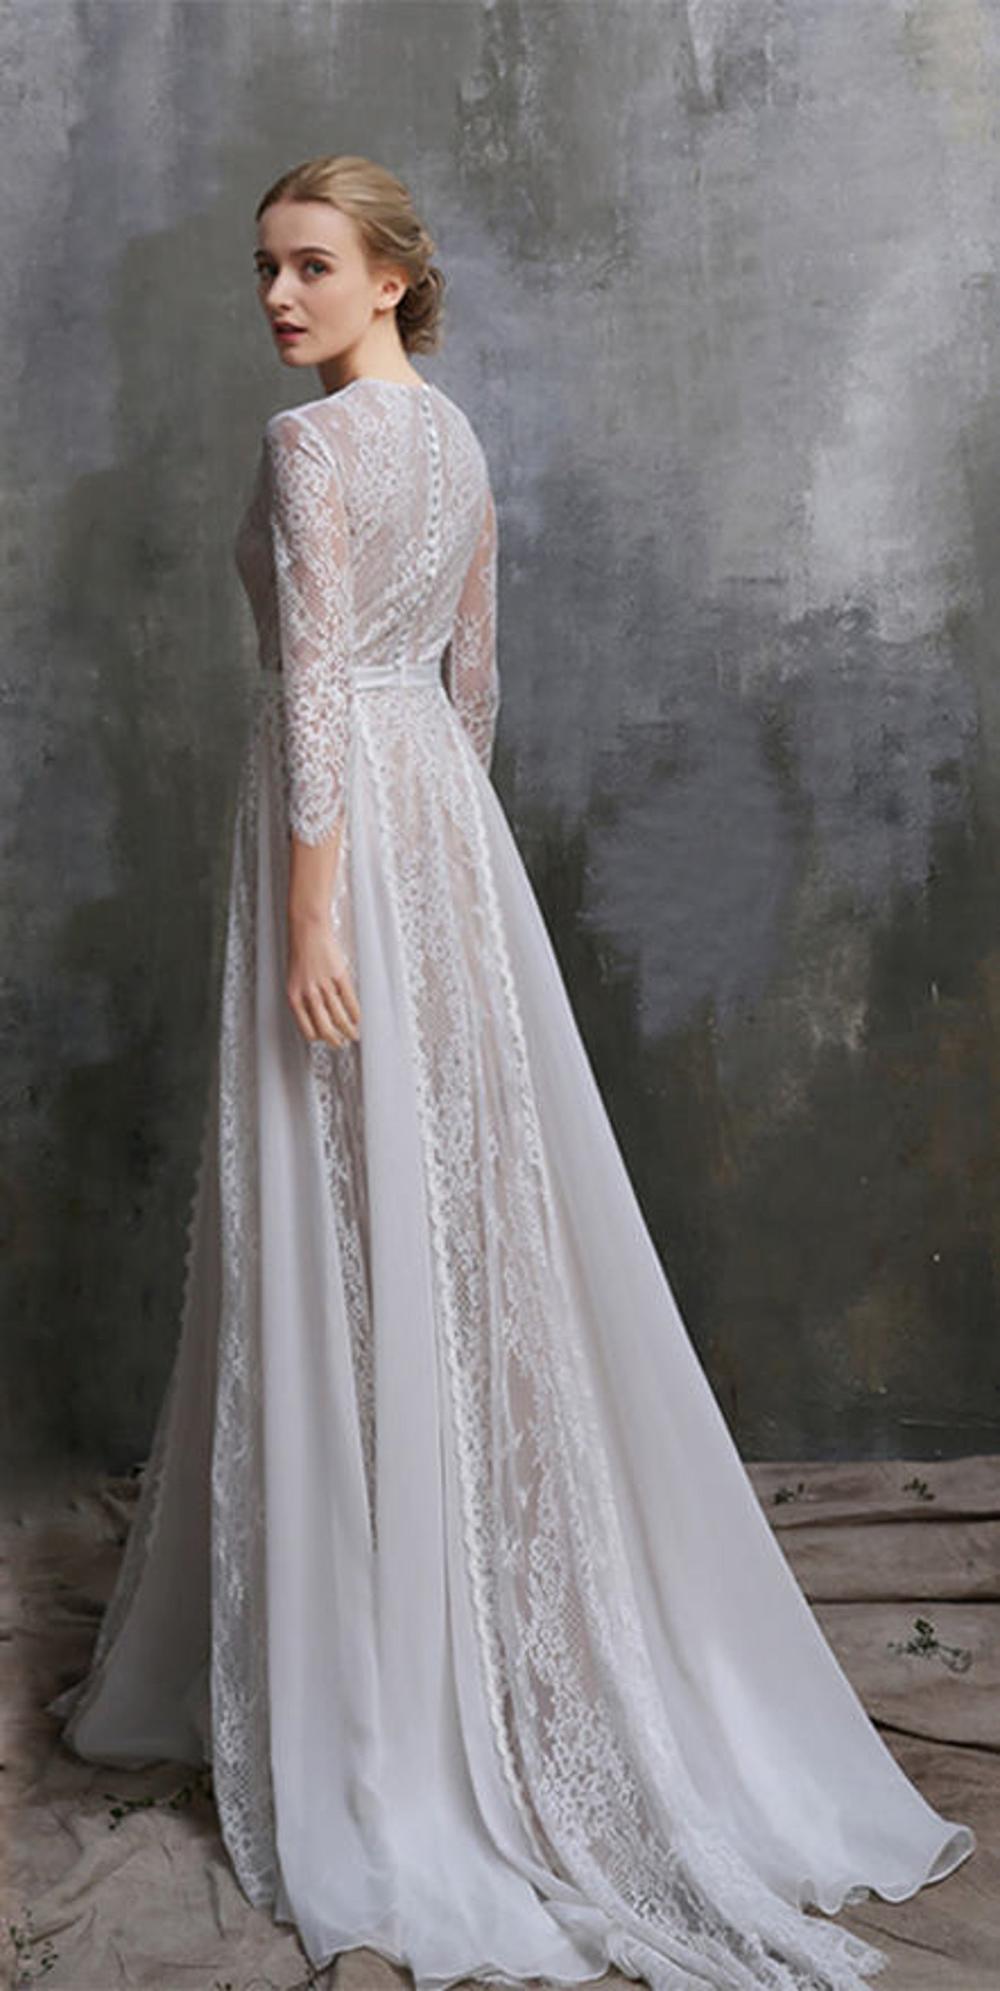 Boho Wedding Dress/ White Lace Dress/ Bohemian wedding